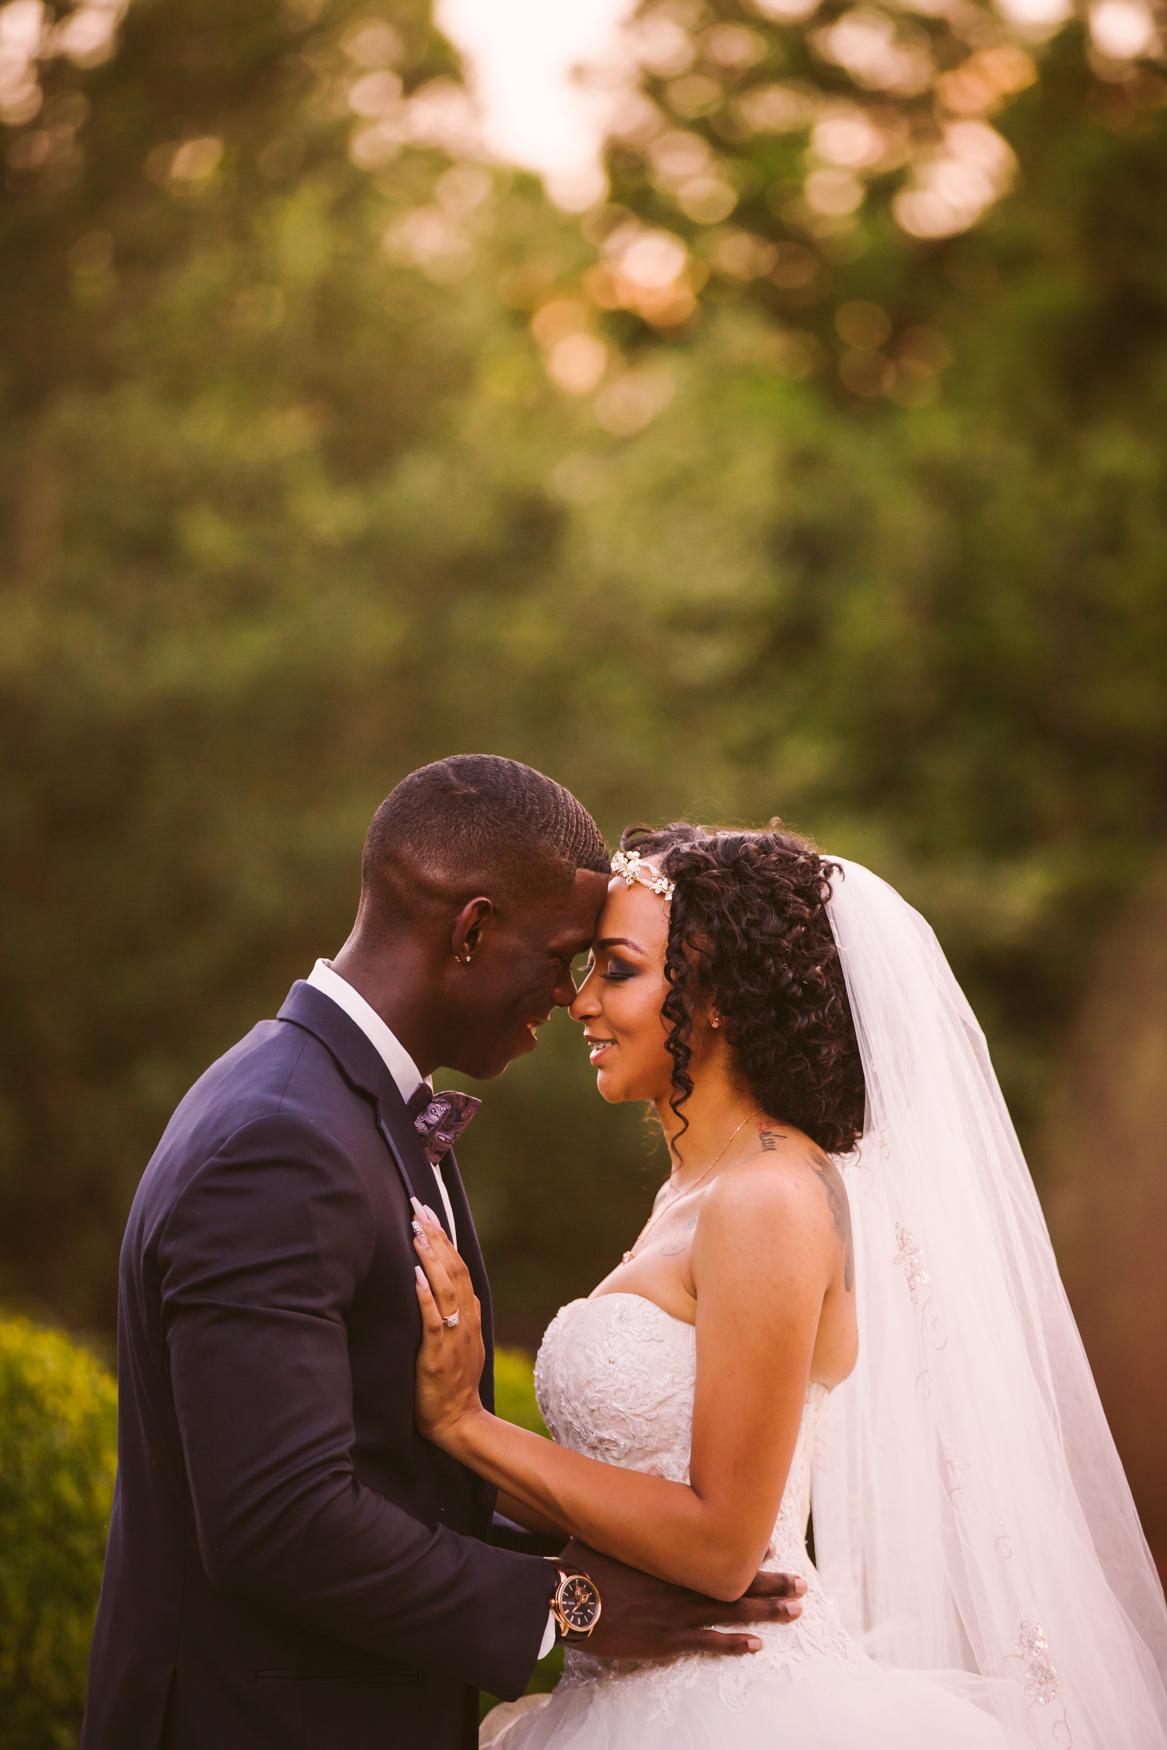 Waynesville Wedding Photography | Sunset Portrait